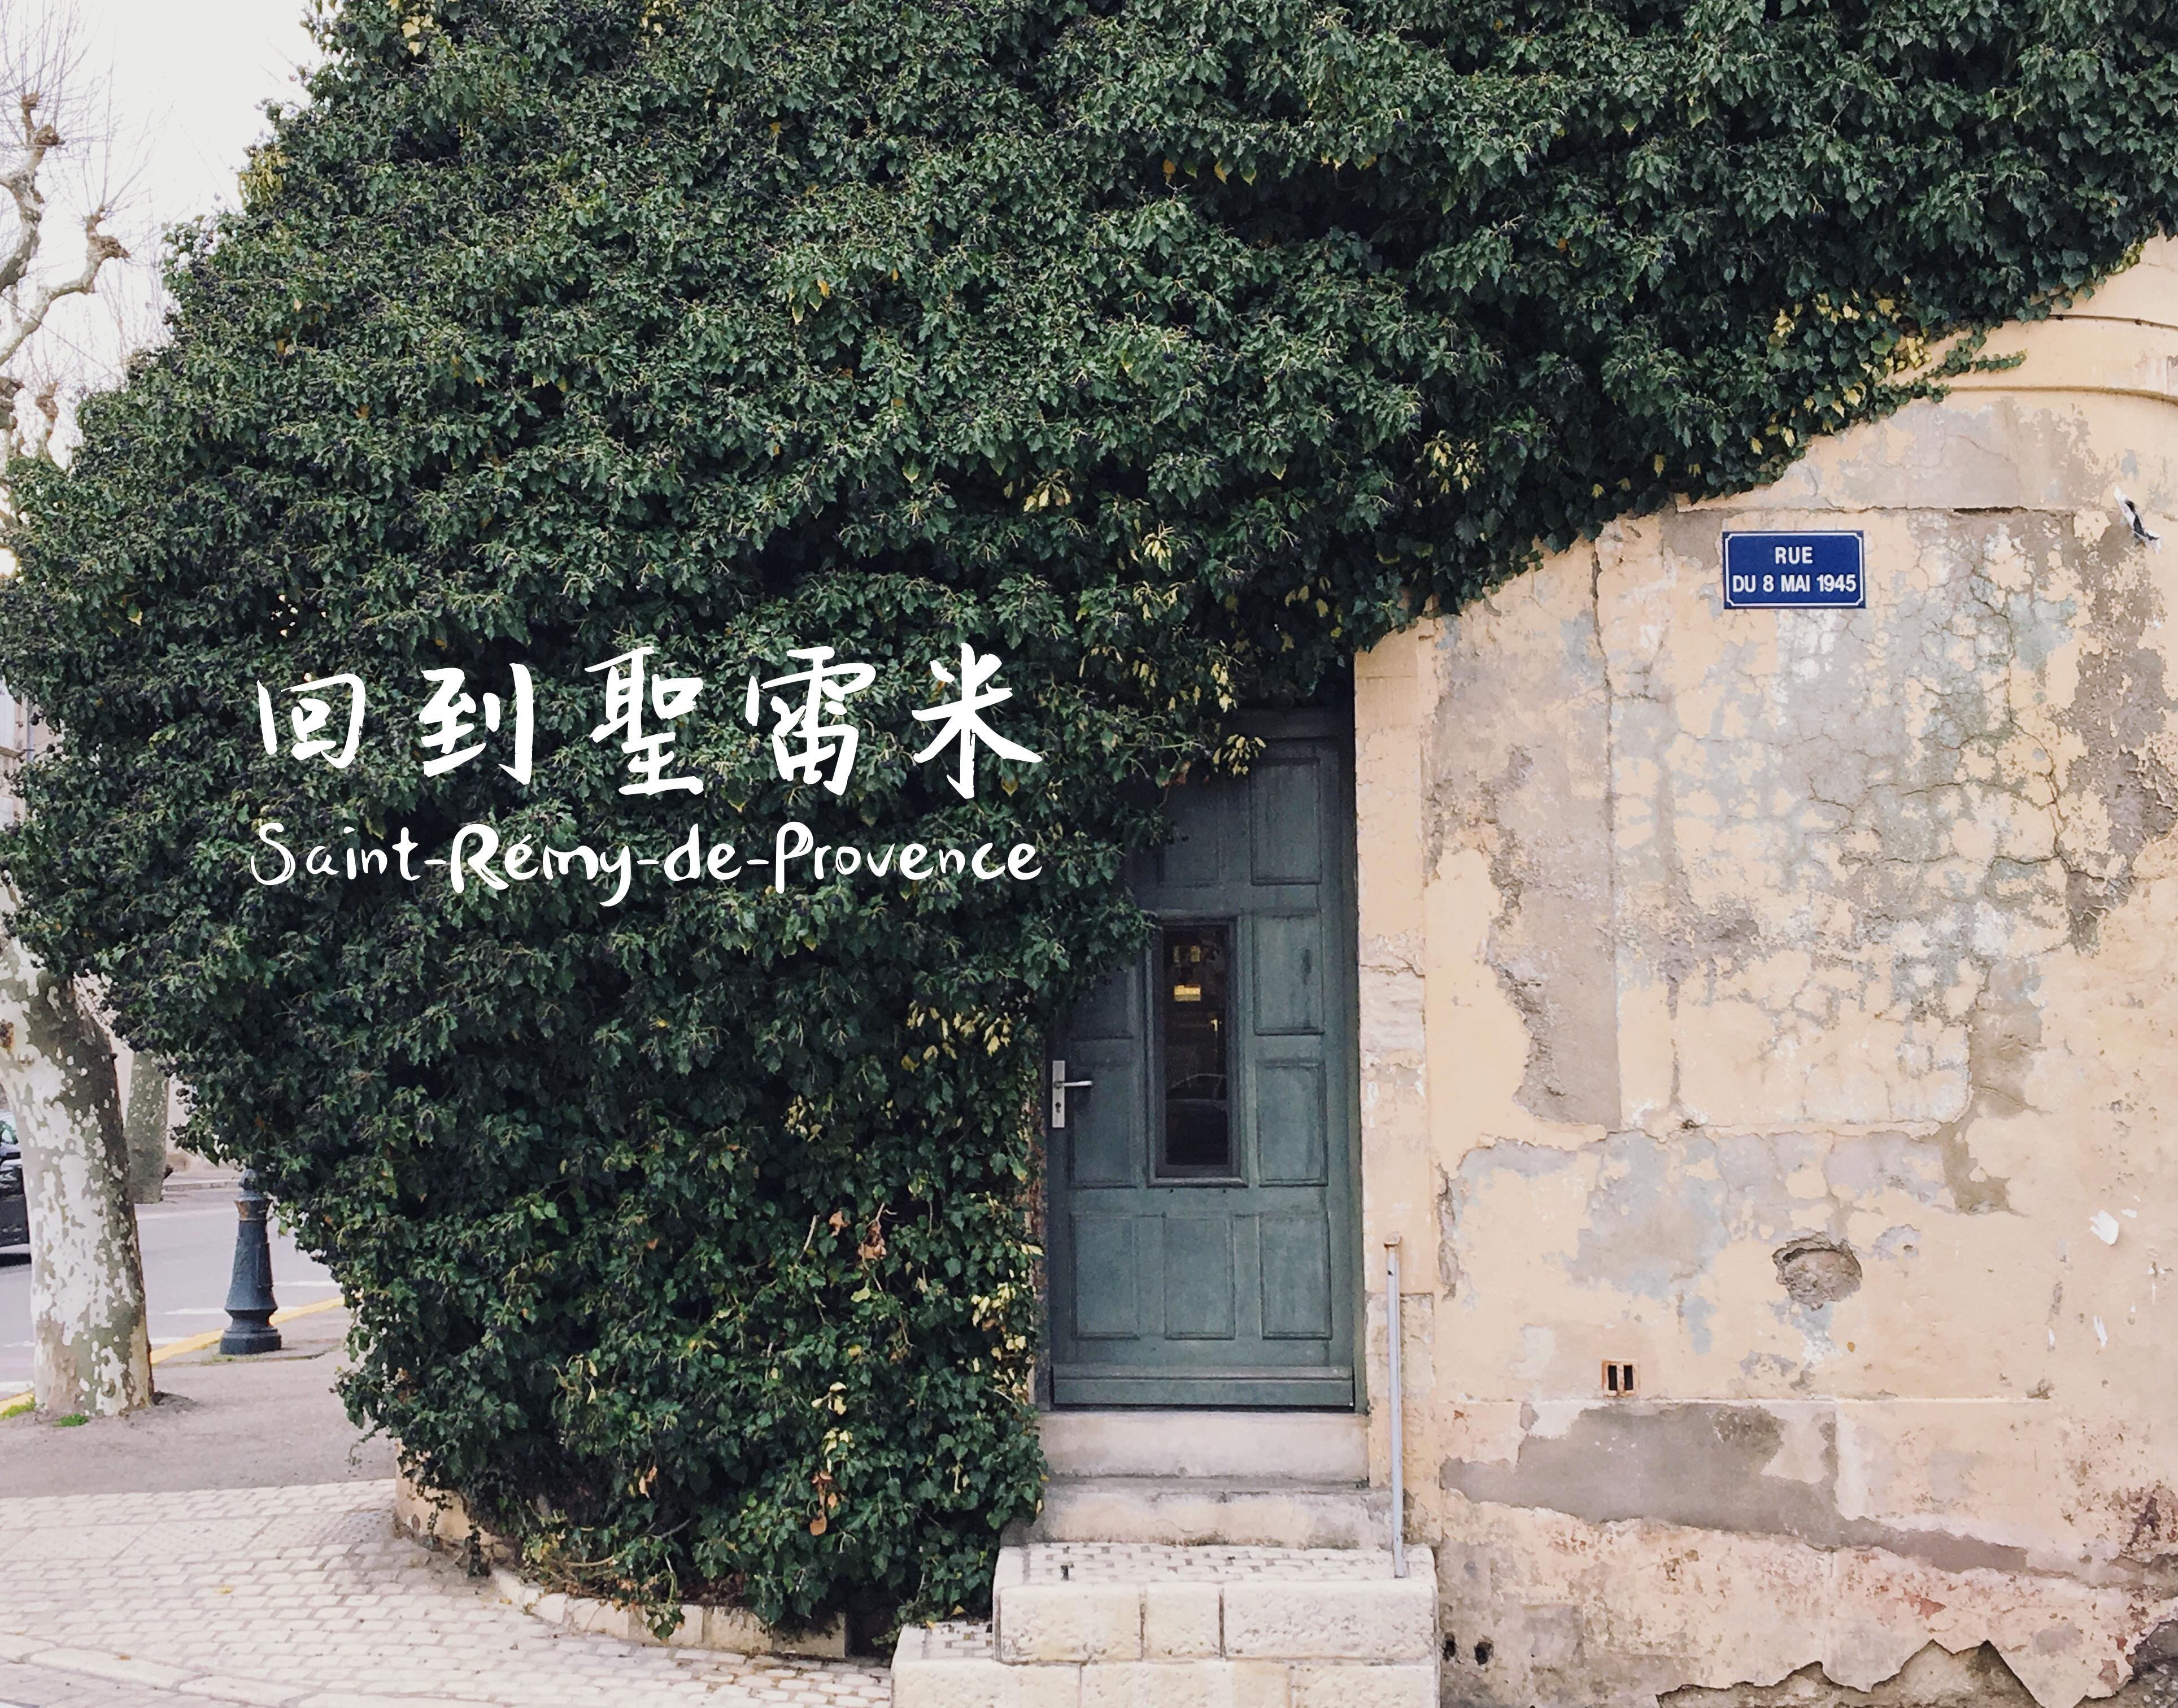 【荷比葡法摩】小情小調小歐遊   又到萊博 Les-Baux-de-Provence (again!)